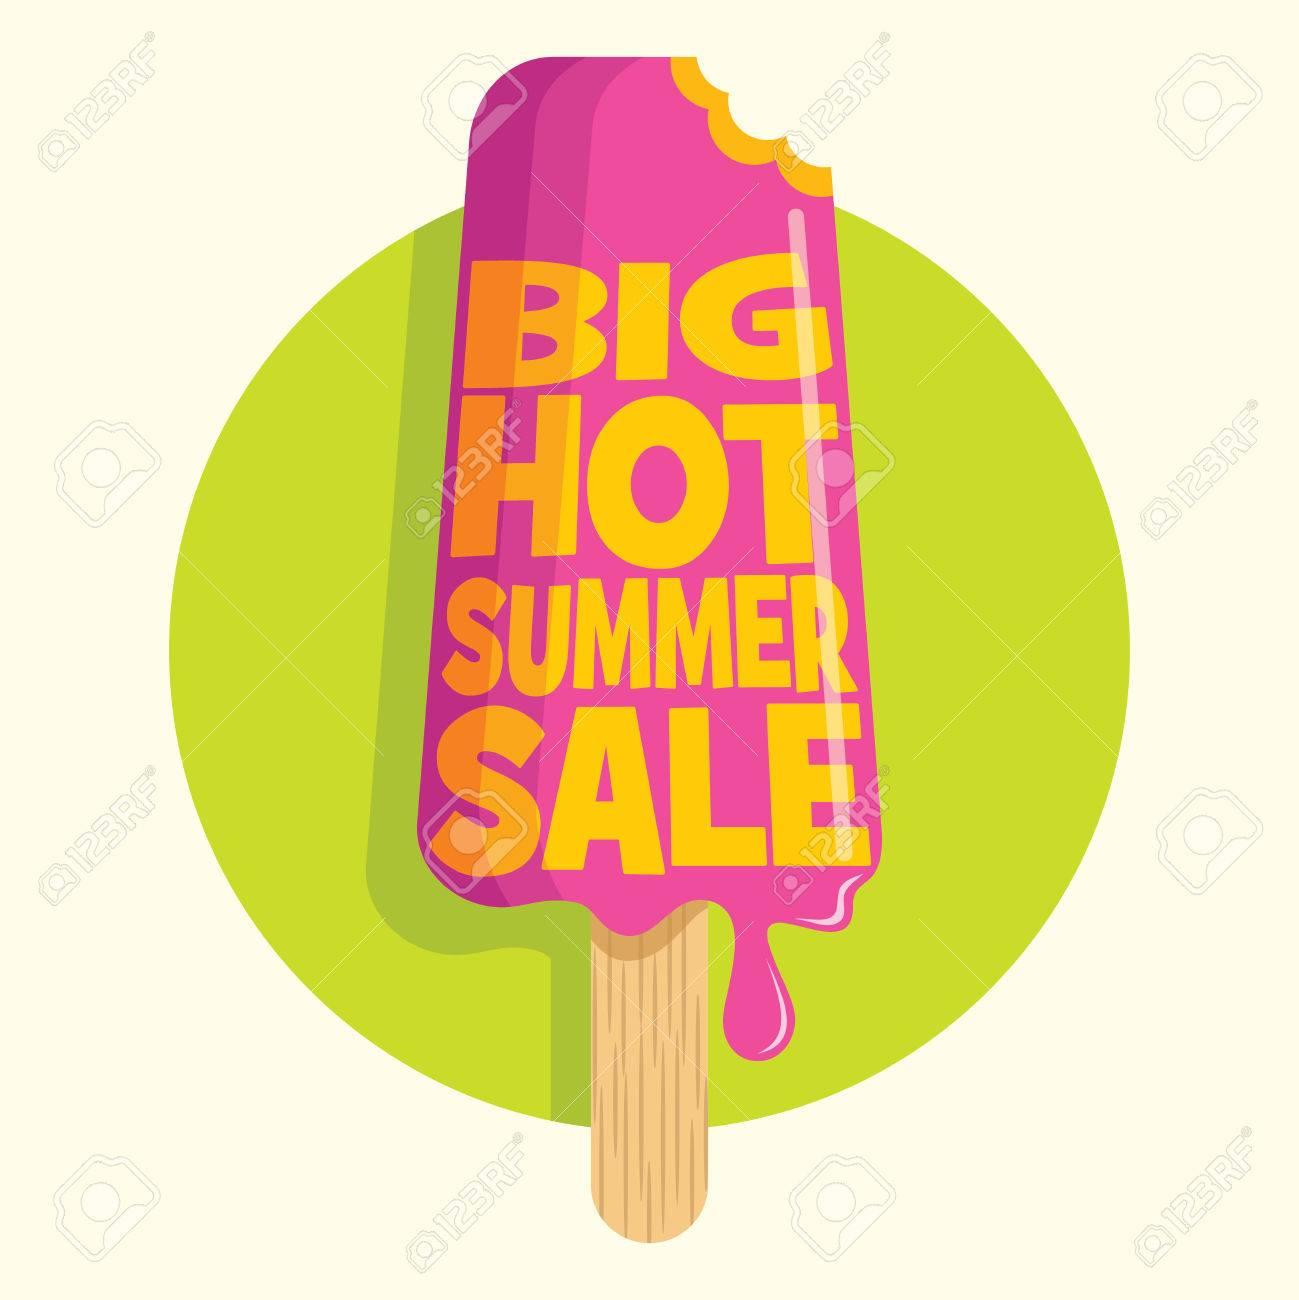 Summer sale design template Standard-Bild - 39942911